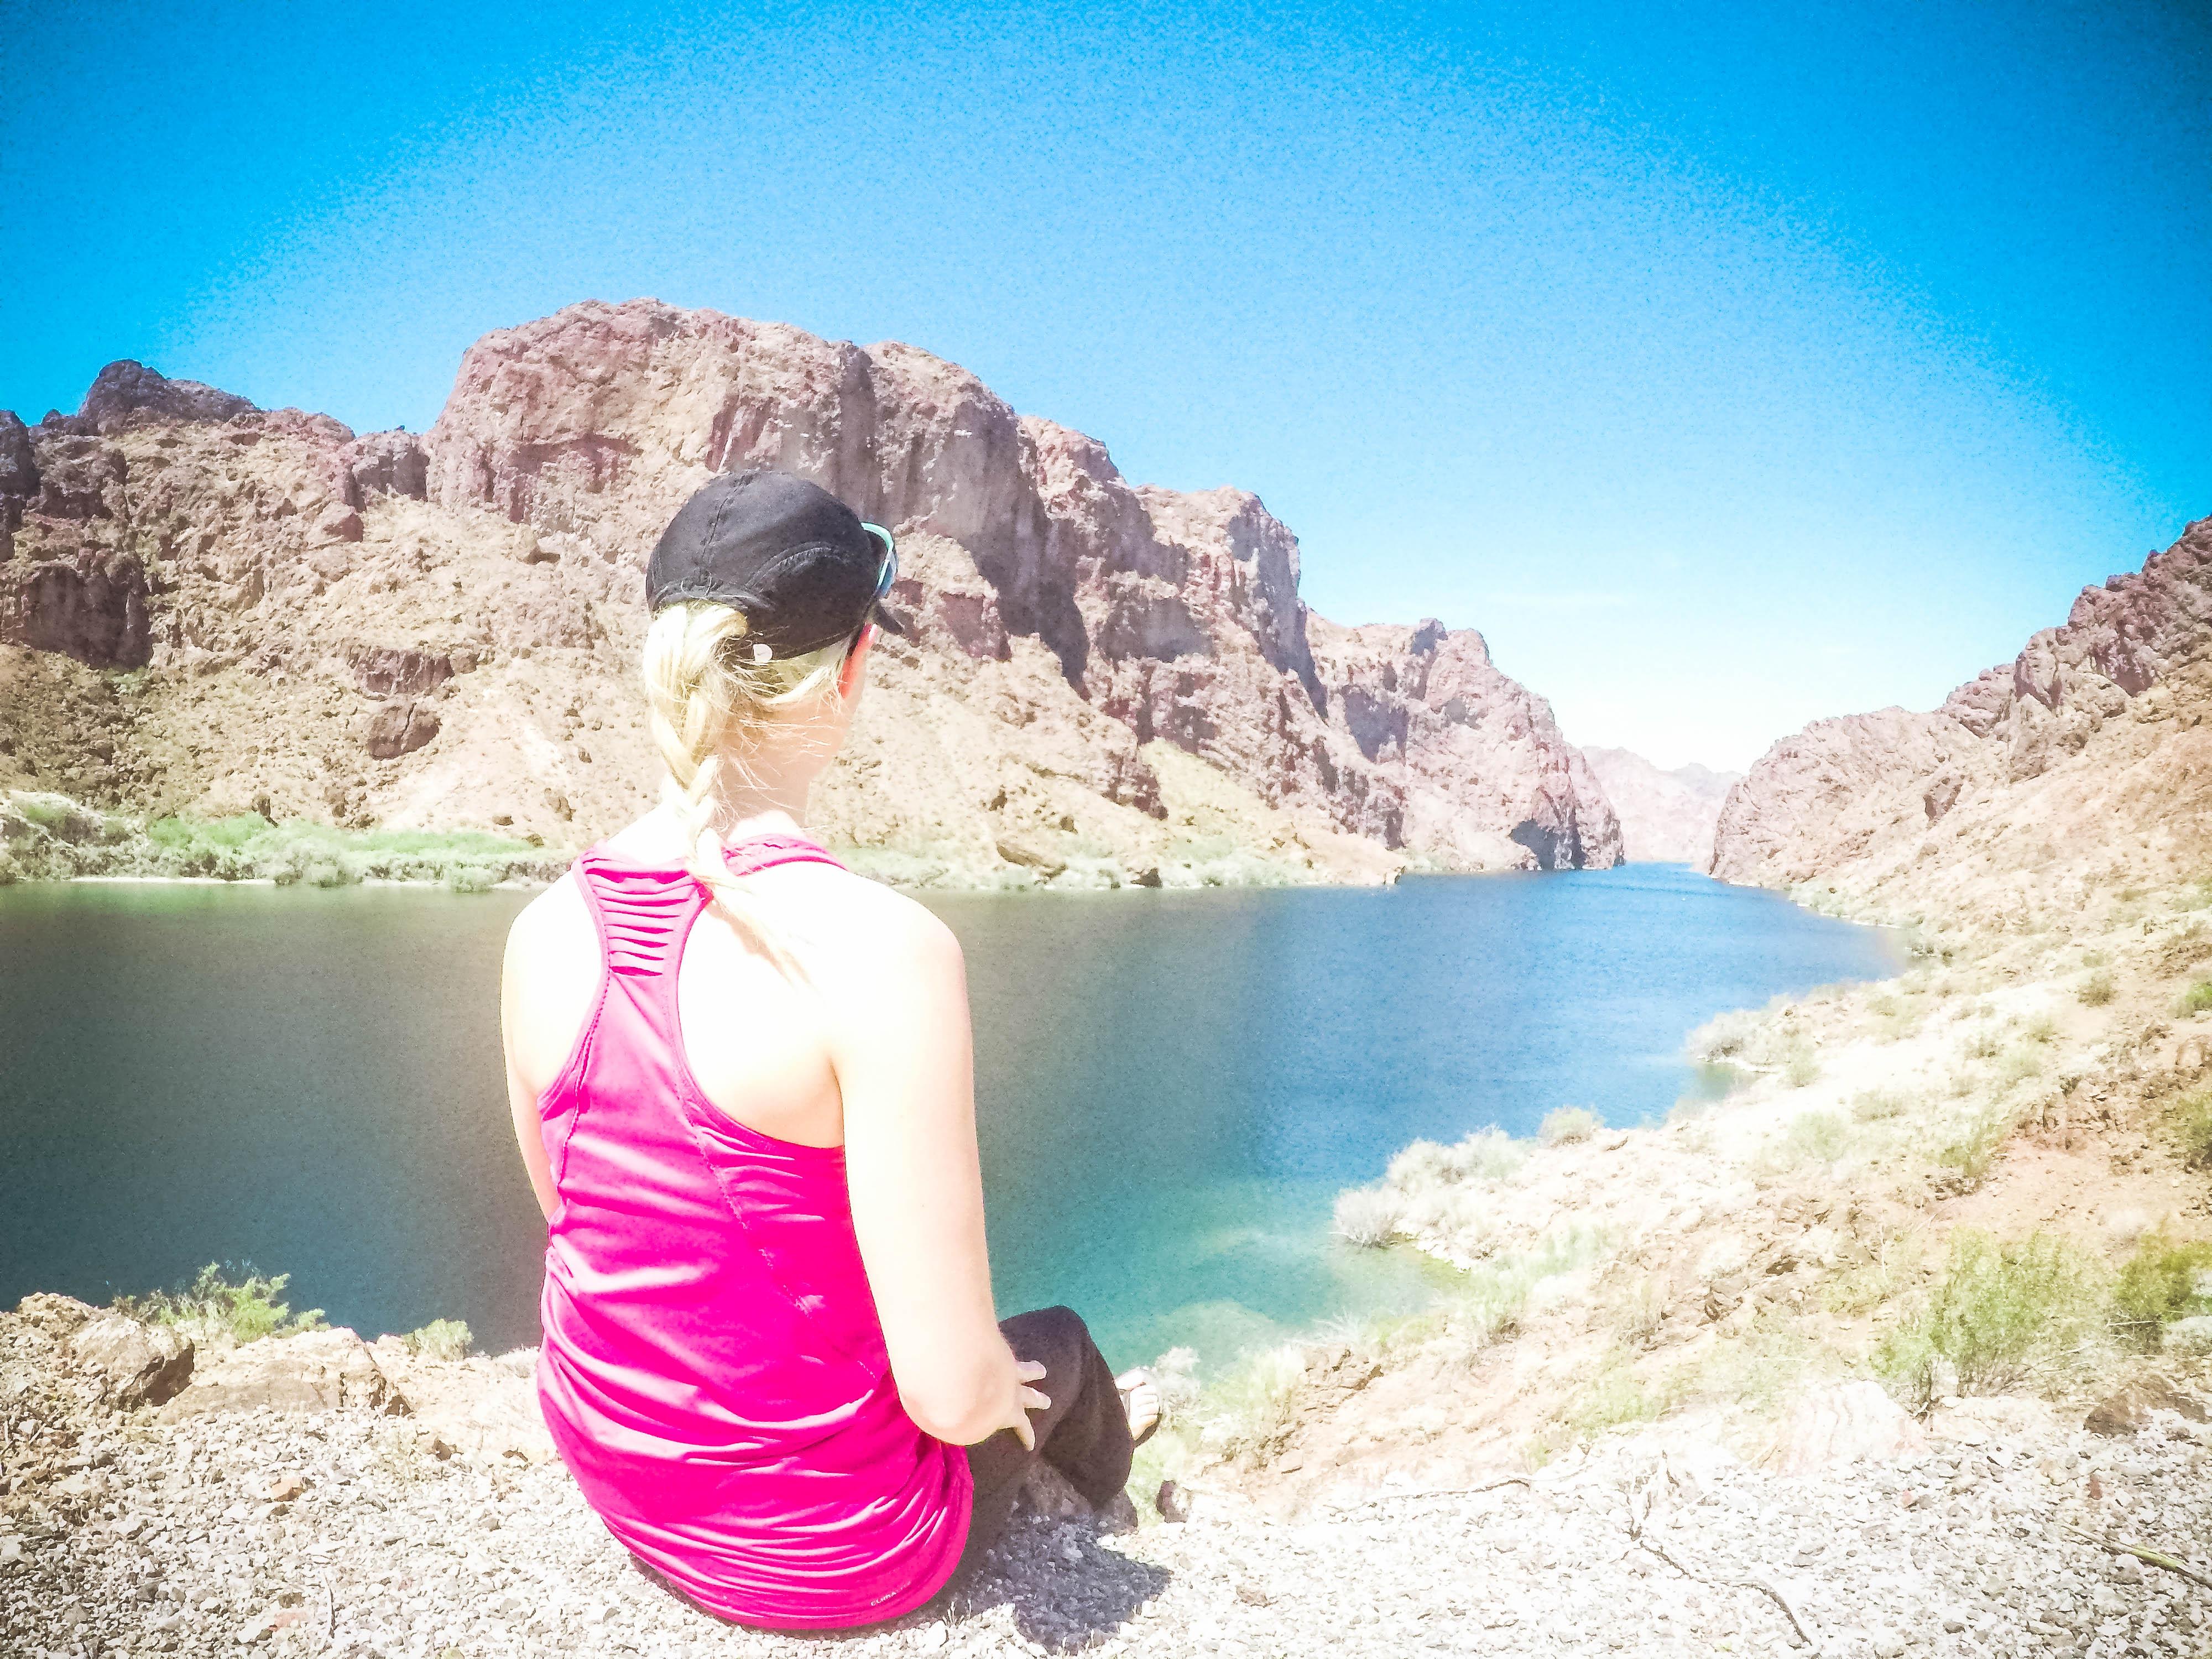 a short hike break from kayaking the black canyon, arizona